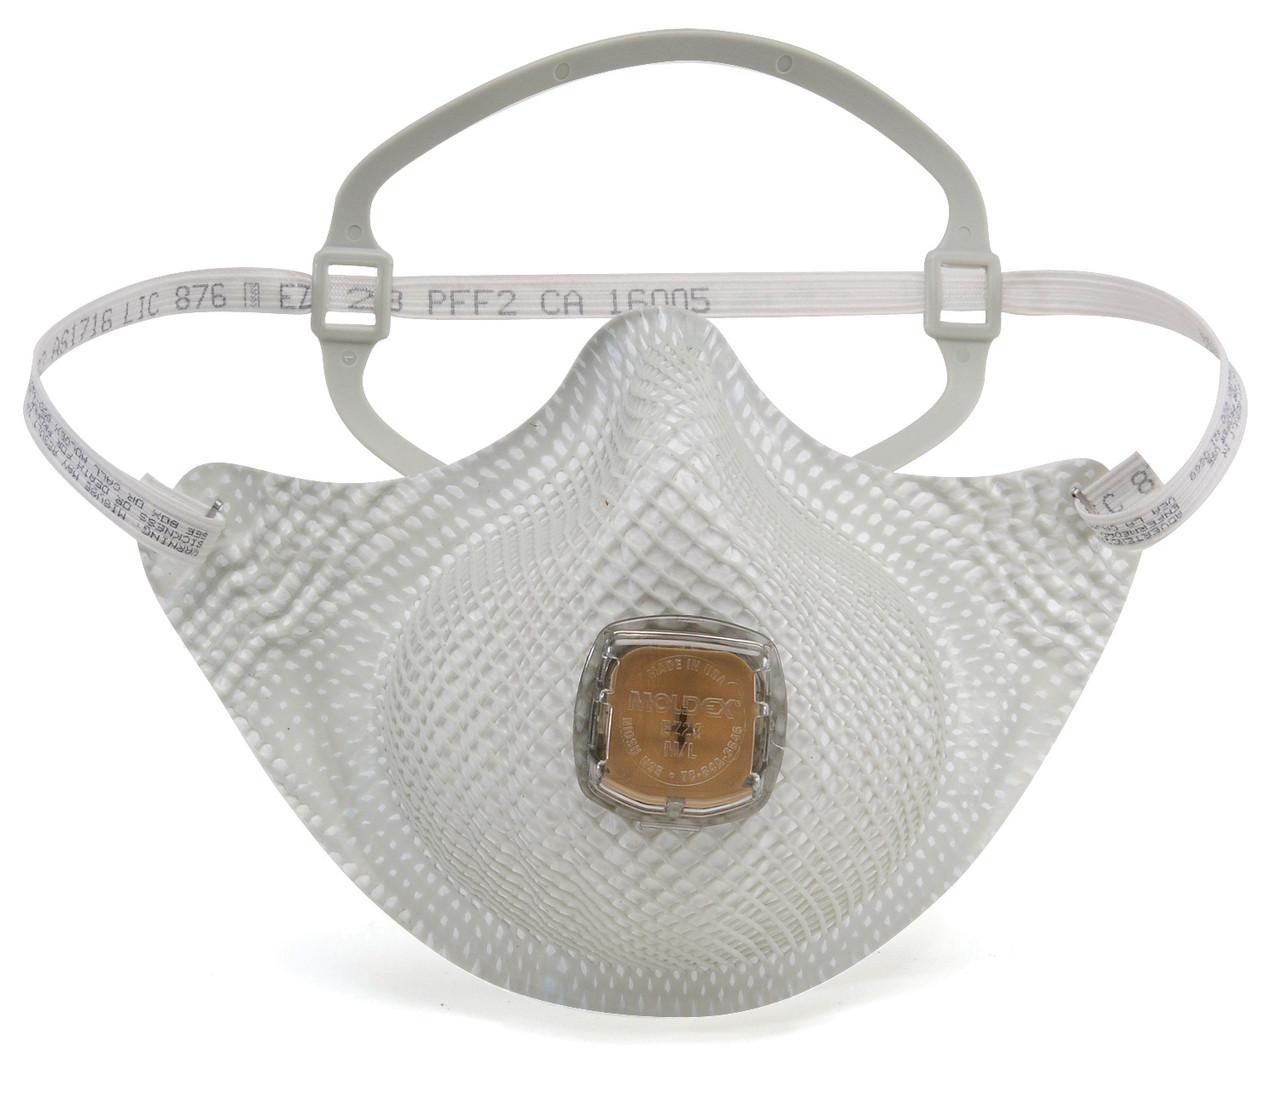 moldex n95 respirator mask